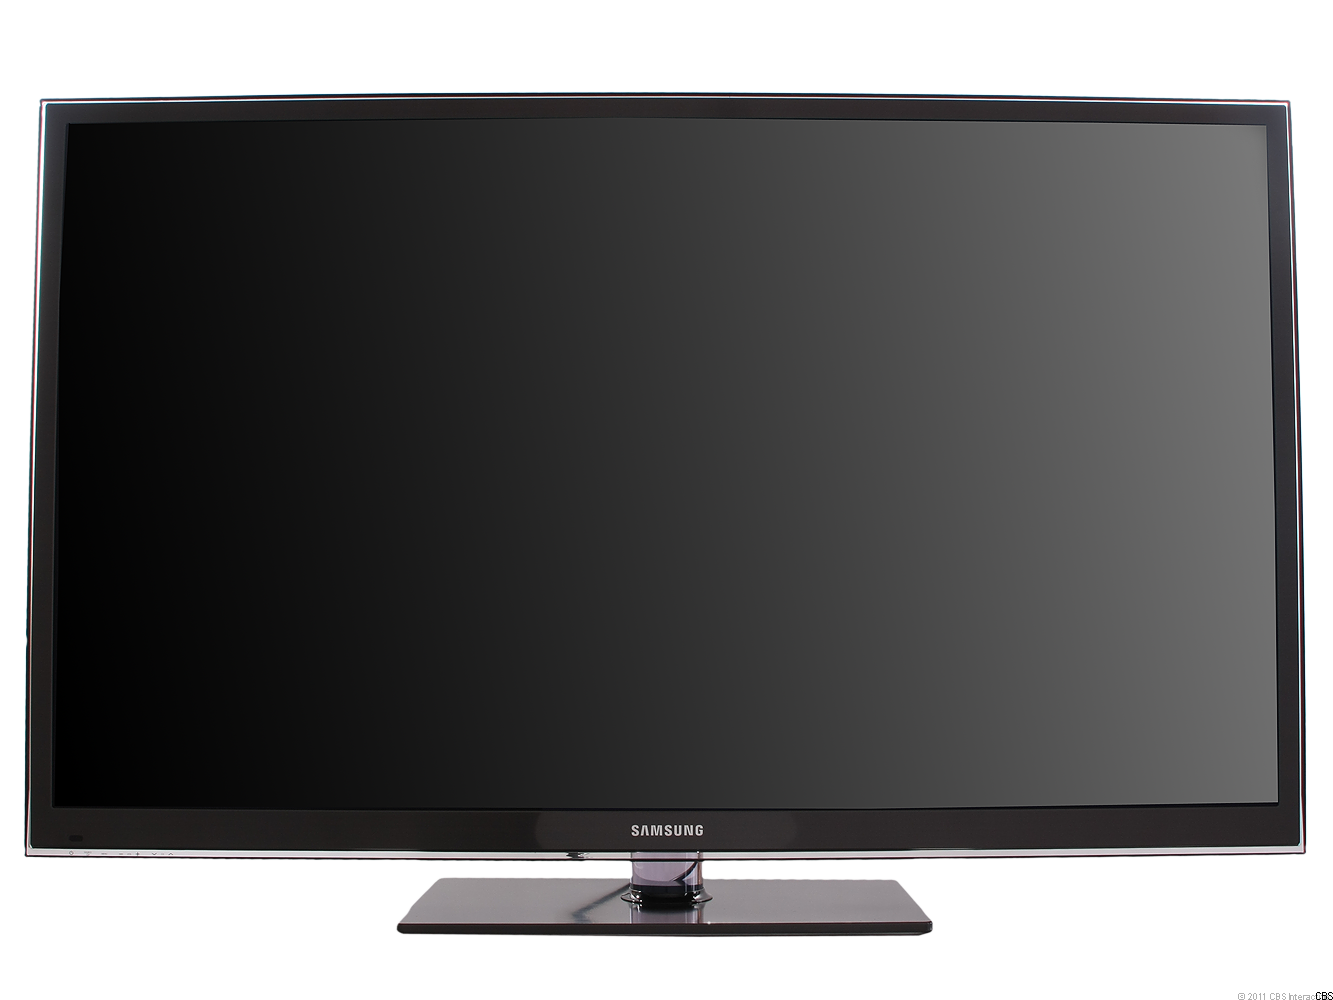 Samsung PND7000 series - Top TV picks - Pictures - CBS News